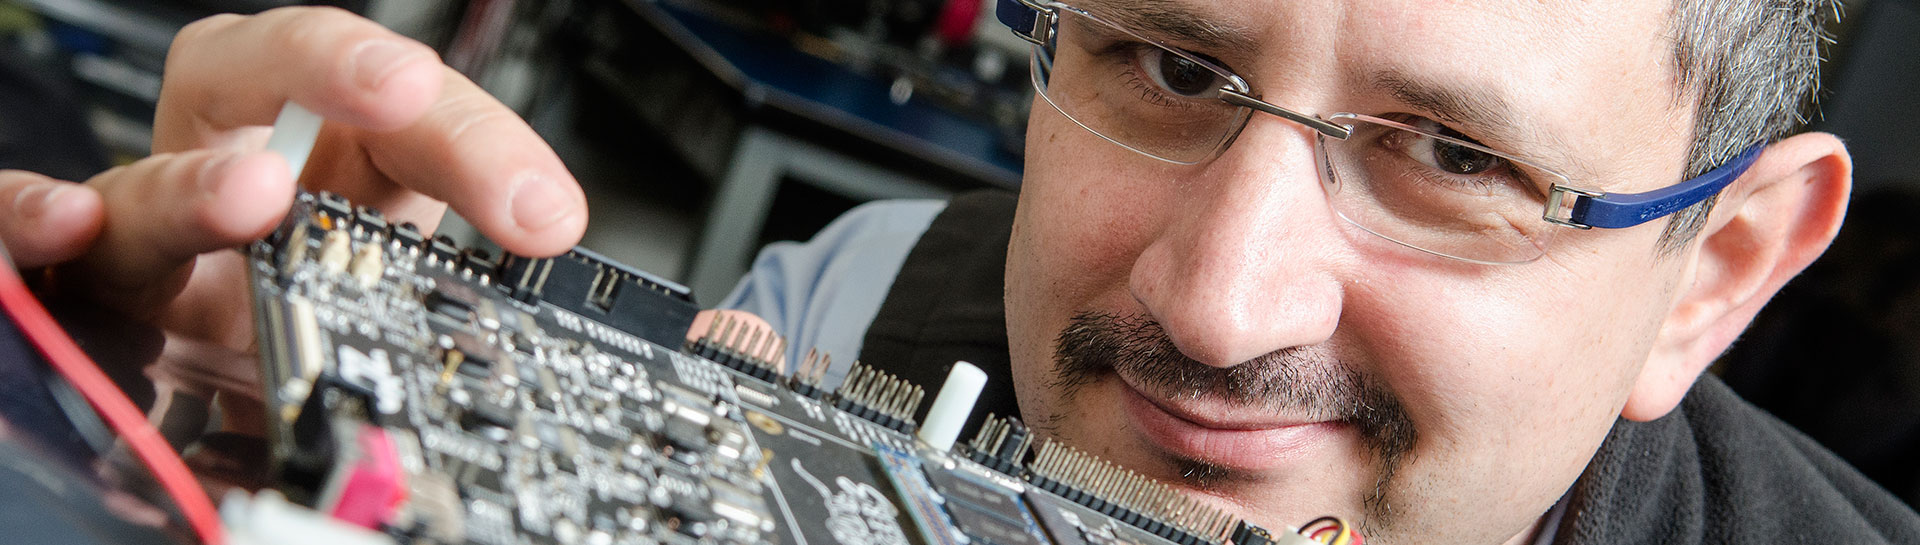 José Martínez: Reimagining computer architecture